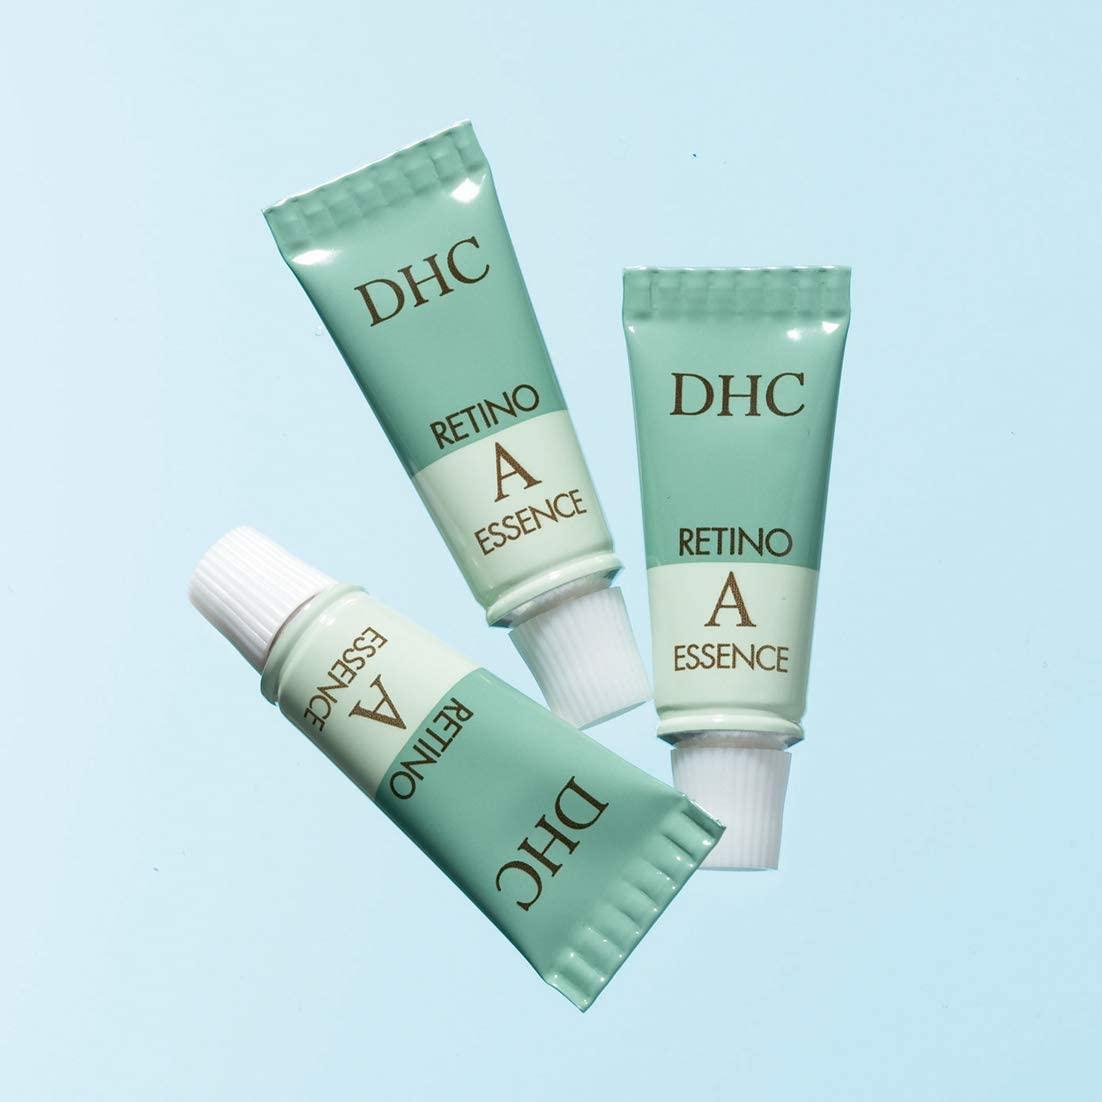 DHC(ディーエイチシー) 薬用レチノAエッセンス